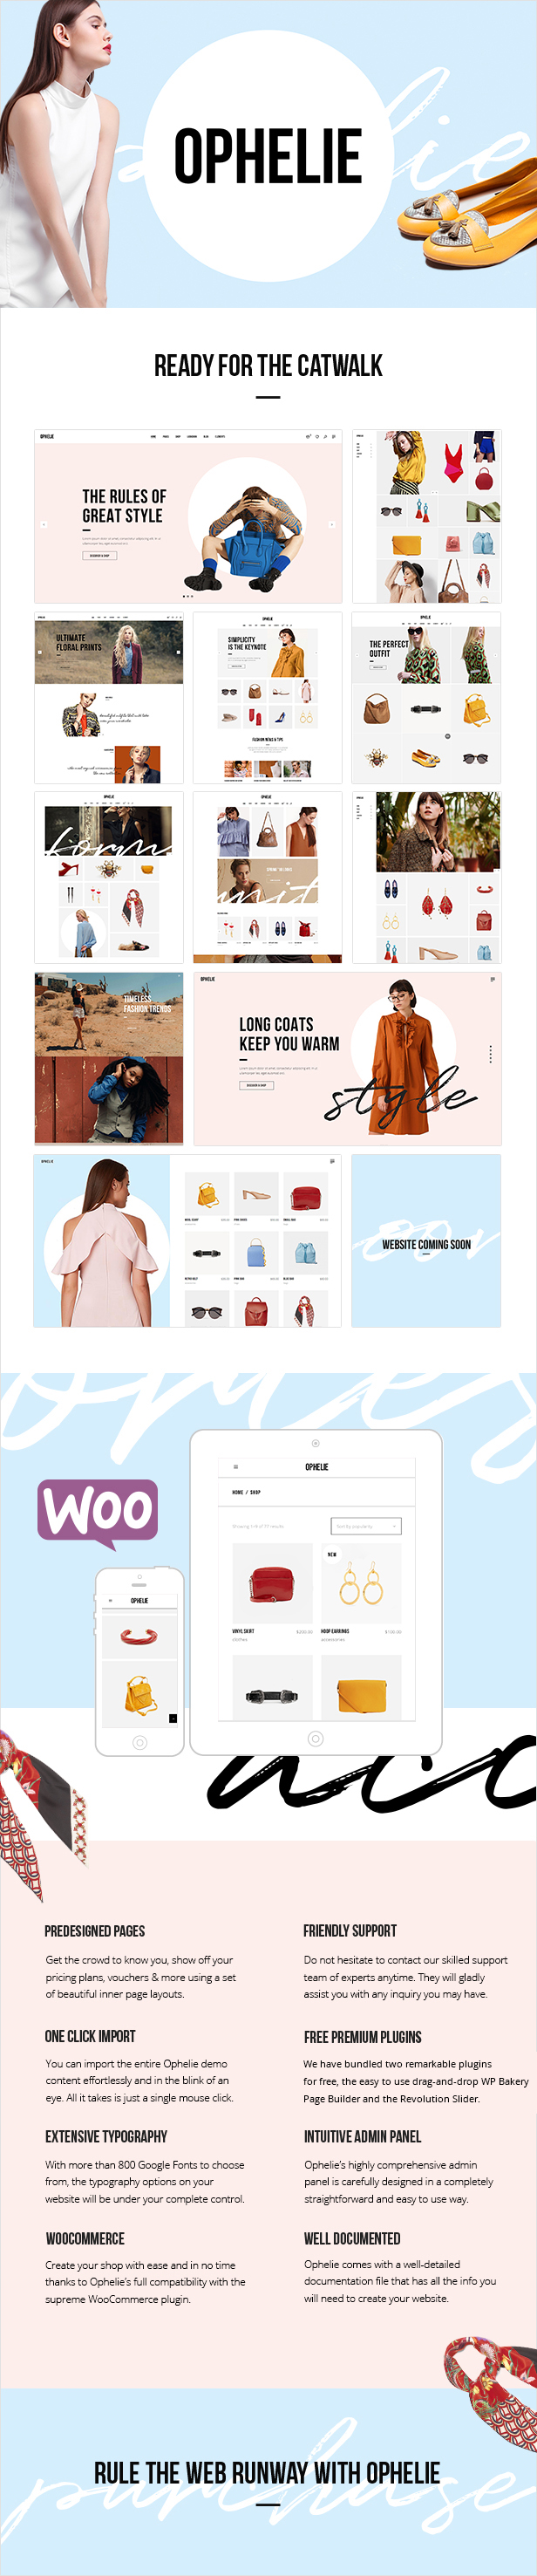 Ophelie - Fashion Shop Theme - 1